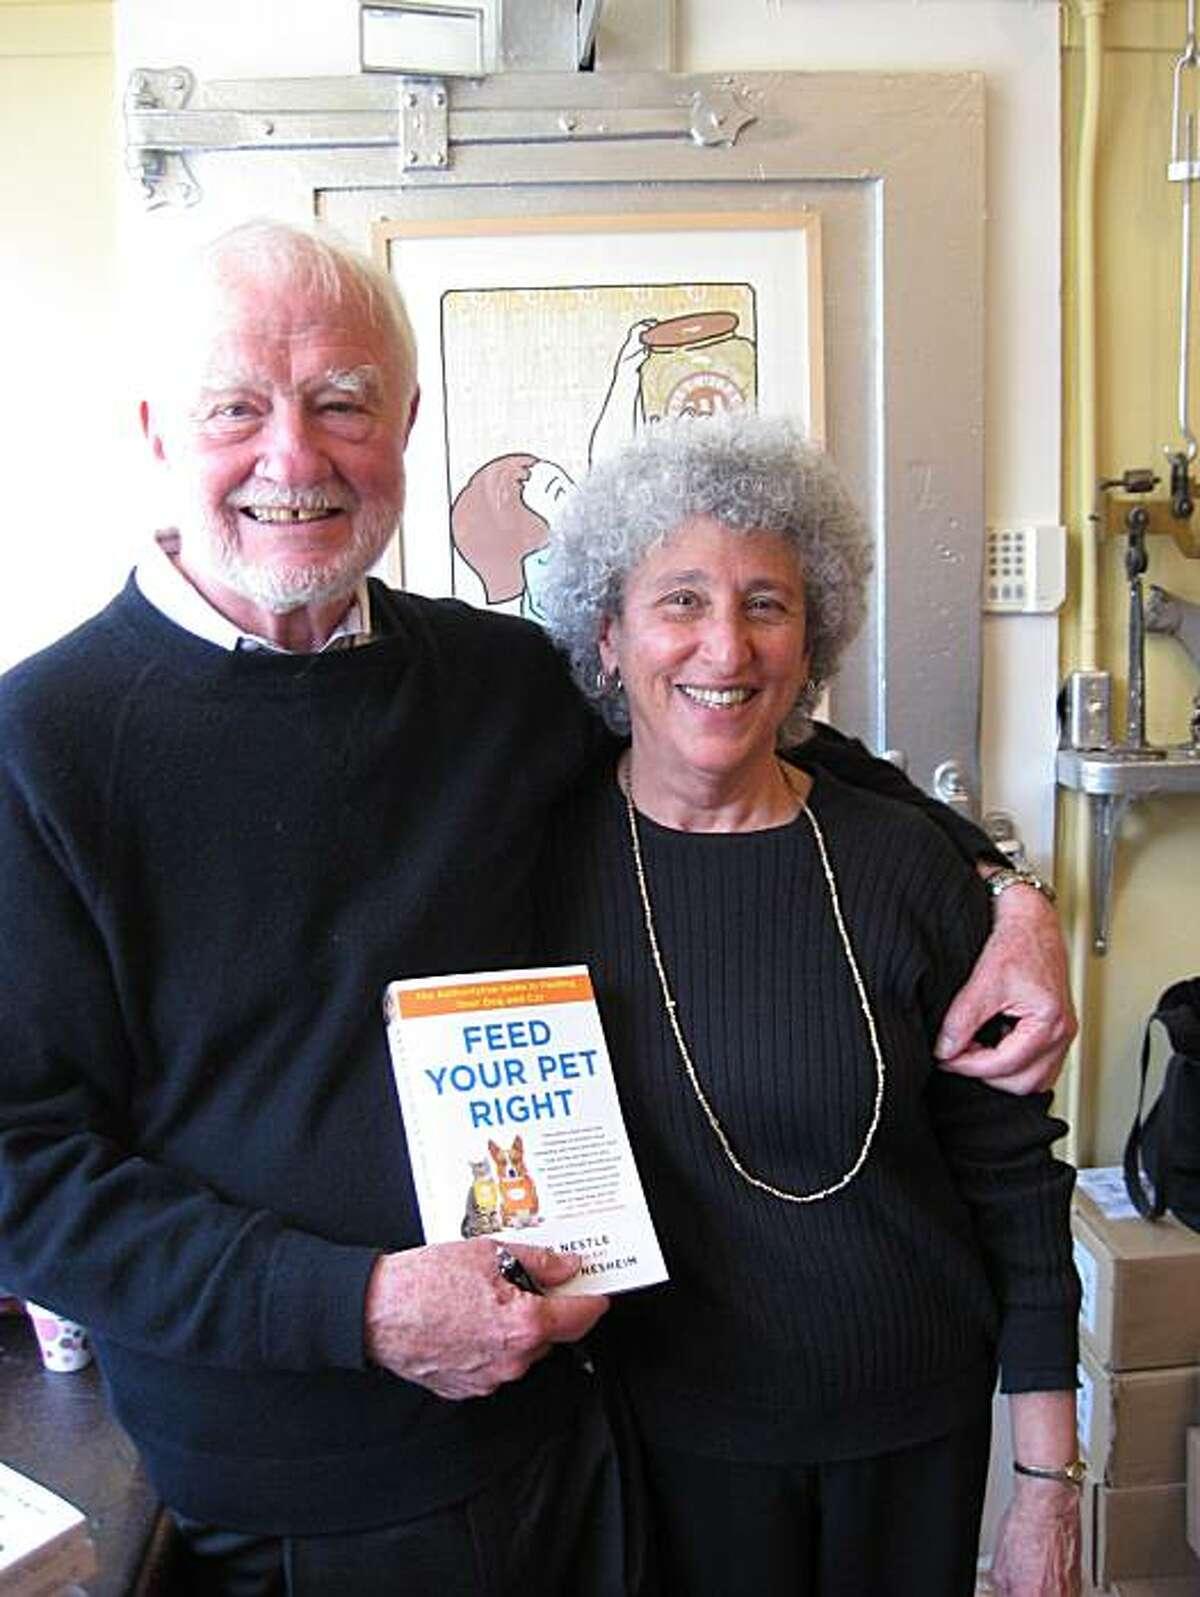 Marion Nestle and Mal Nesheim at San Francisco's Omnivore Books.